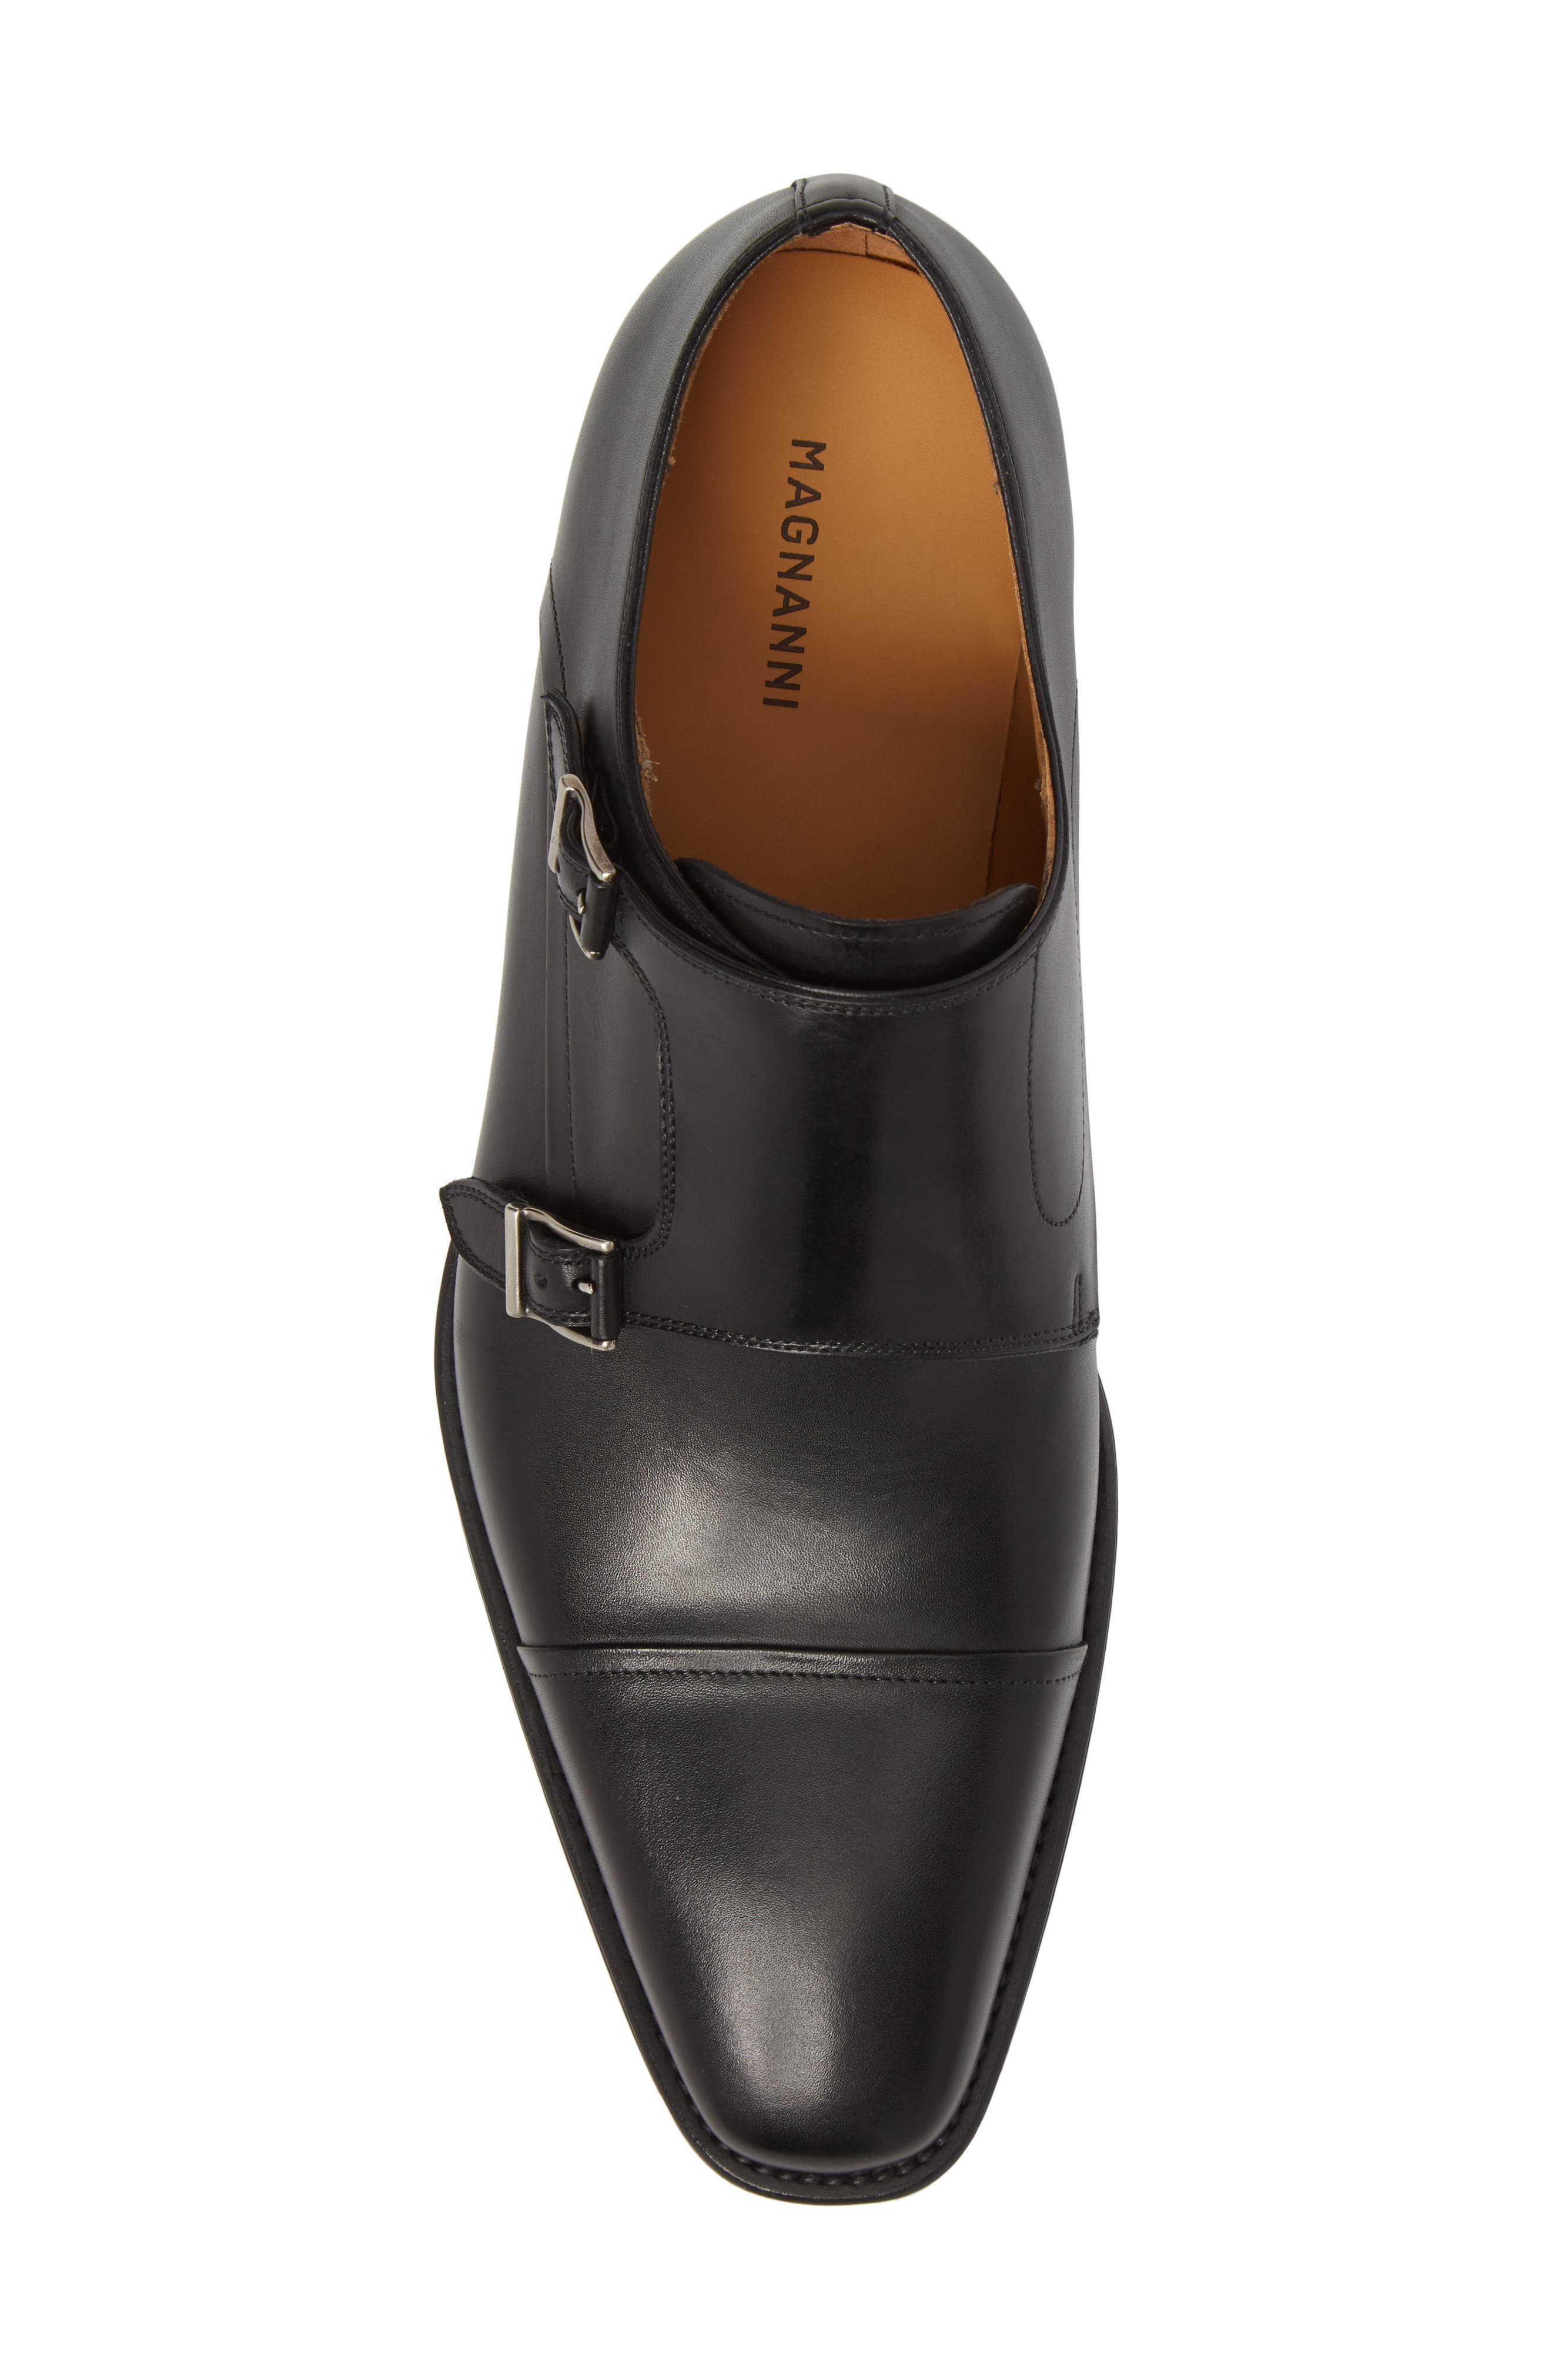 Silvio Double Monk Strap Shoe,                             Alternate thumbnail 5, color,                             Black Leather